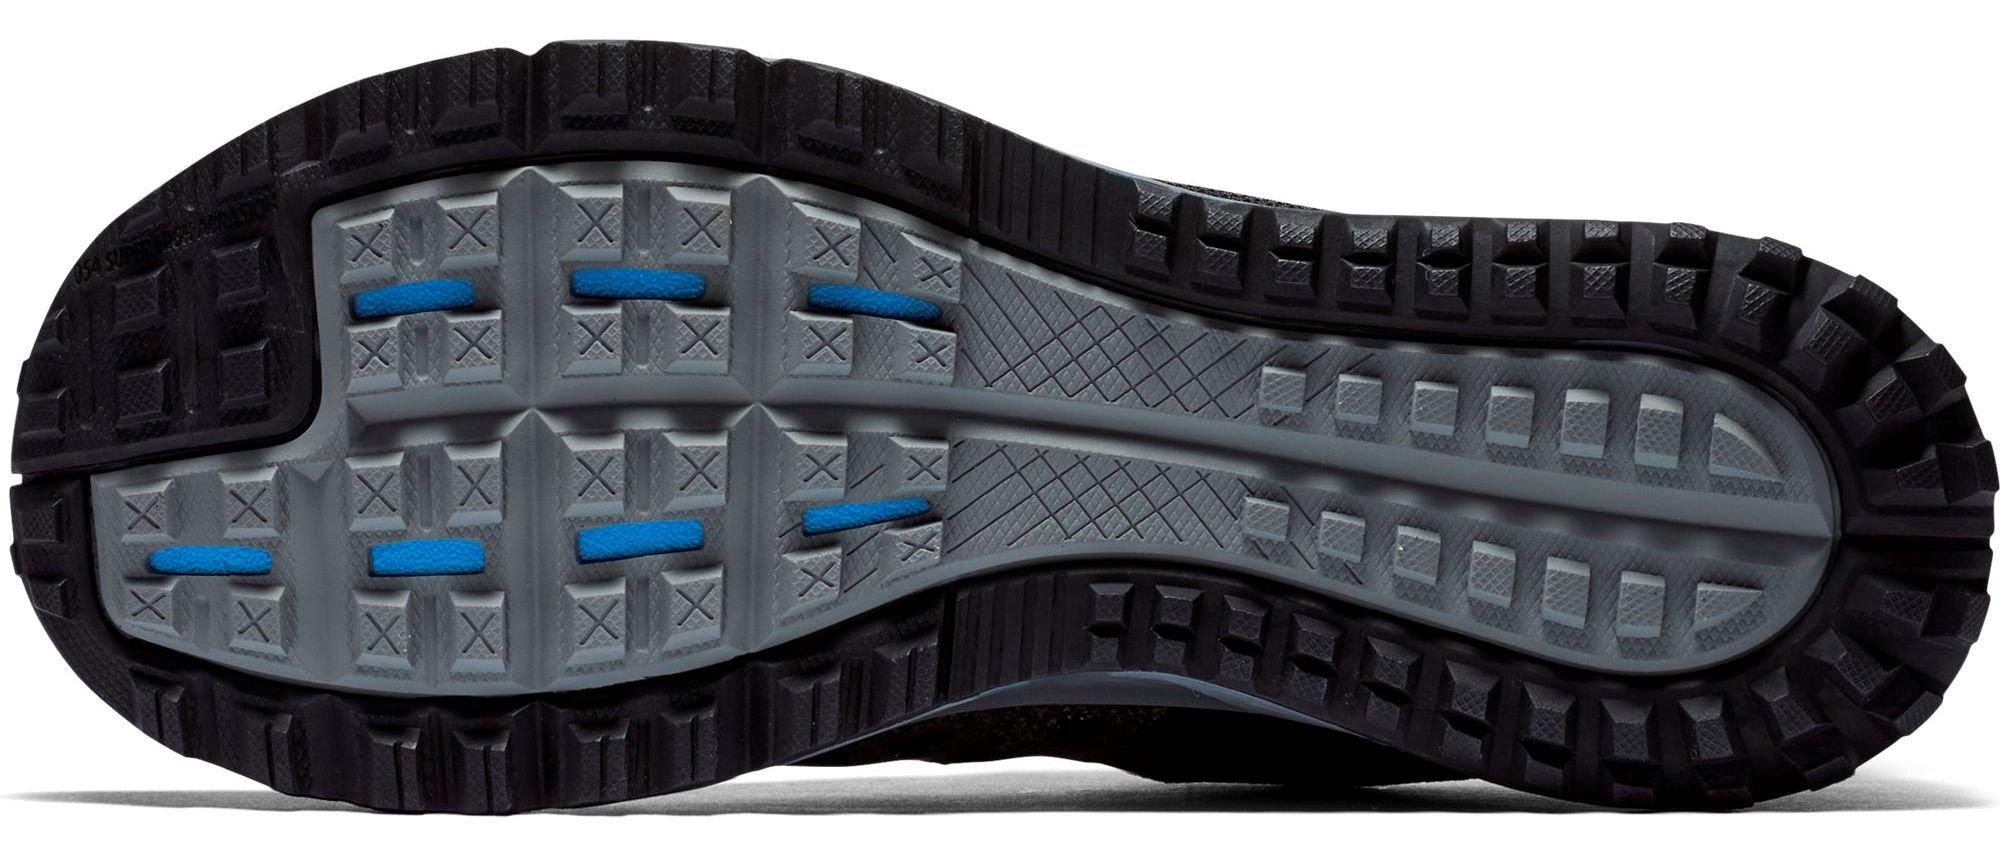 bb15e3e9 Купить кроссовки Nike Zoom Wildhorse 3 G-TX   Интернет-магазин RunLab